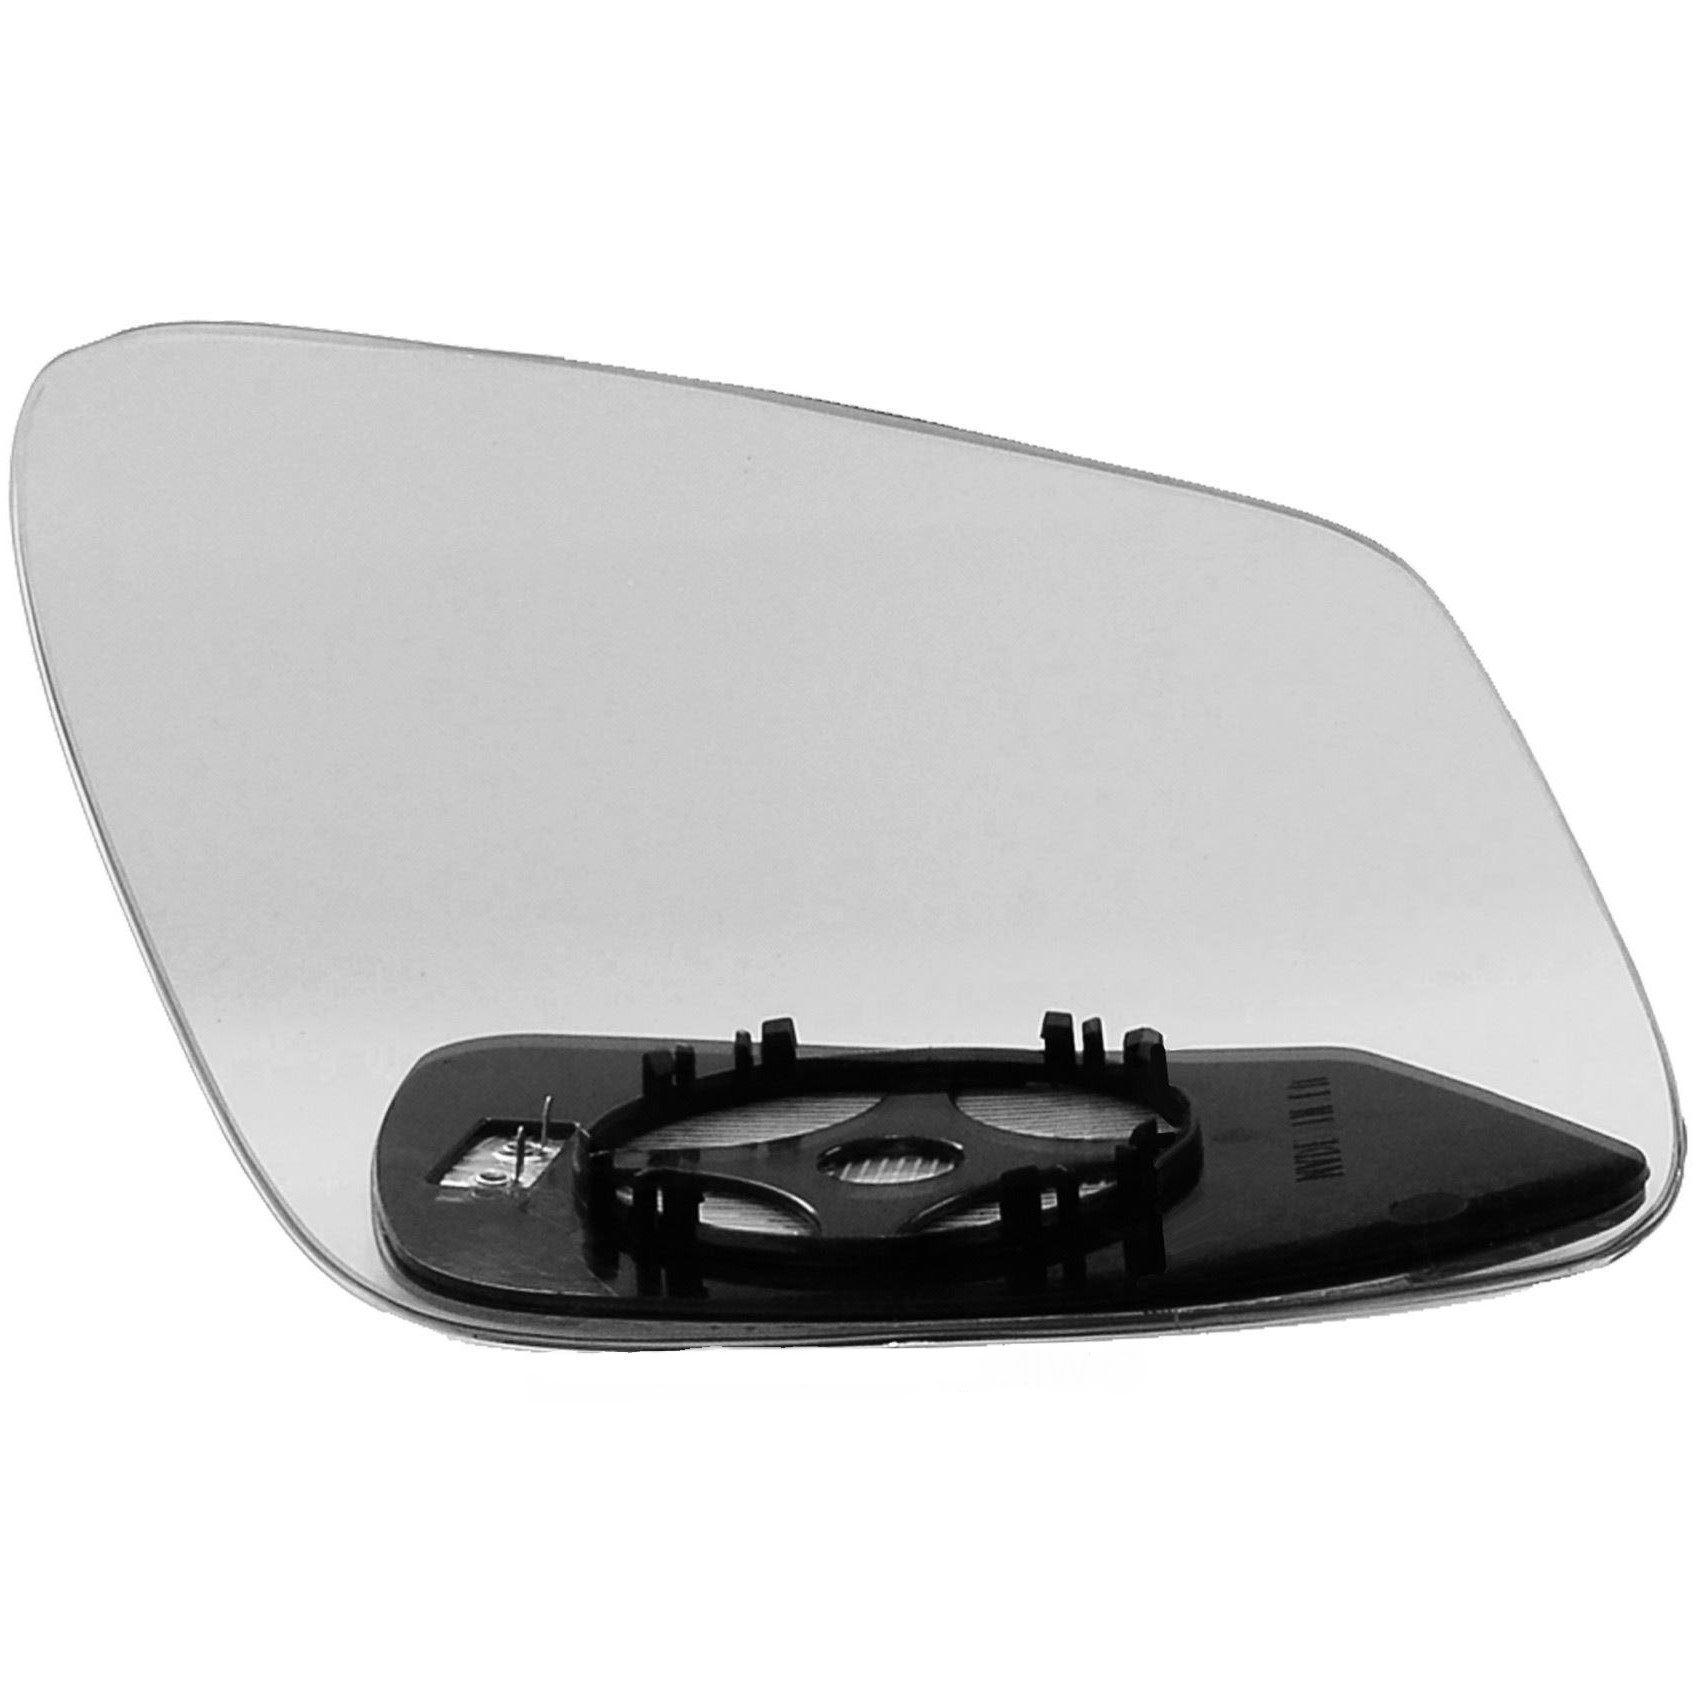 Plaque Right Driver Side Wing Door Mirror Glass for CITROEN C3 2010-2016